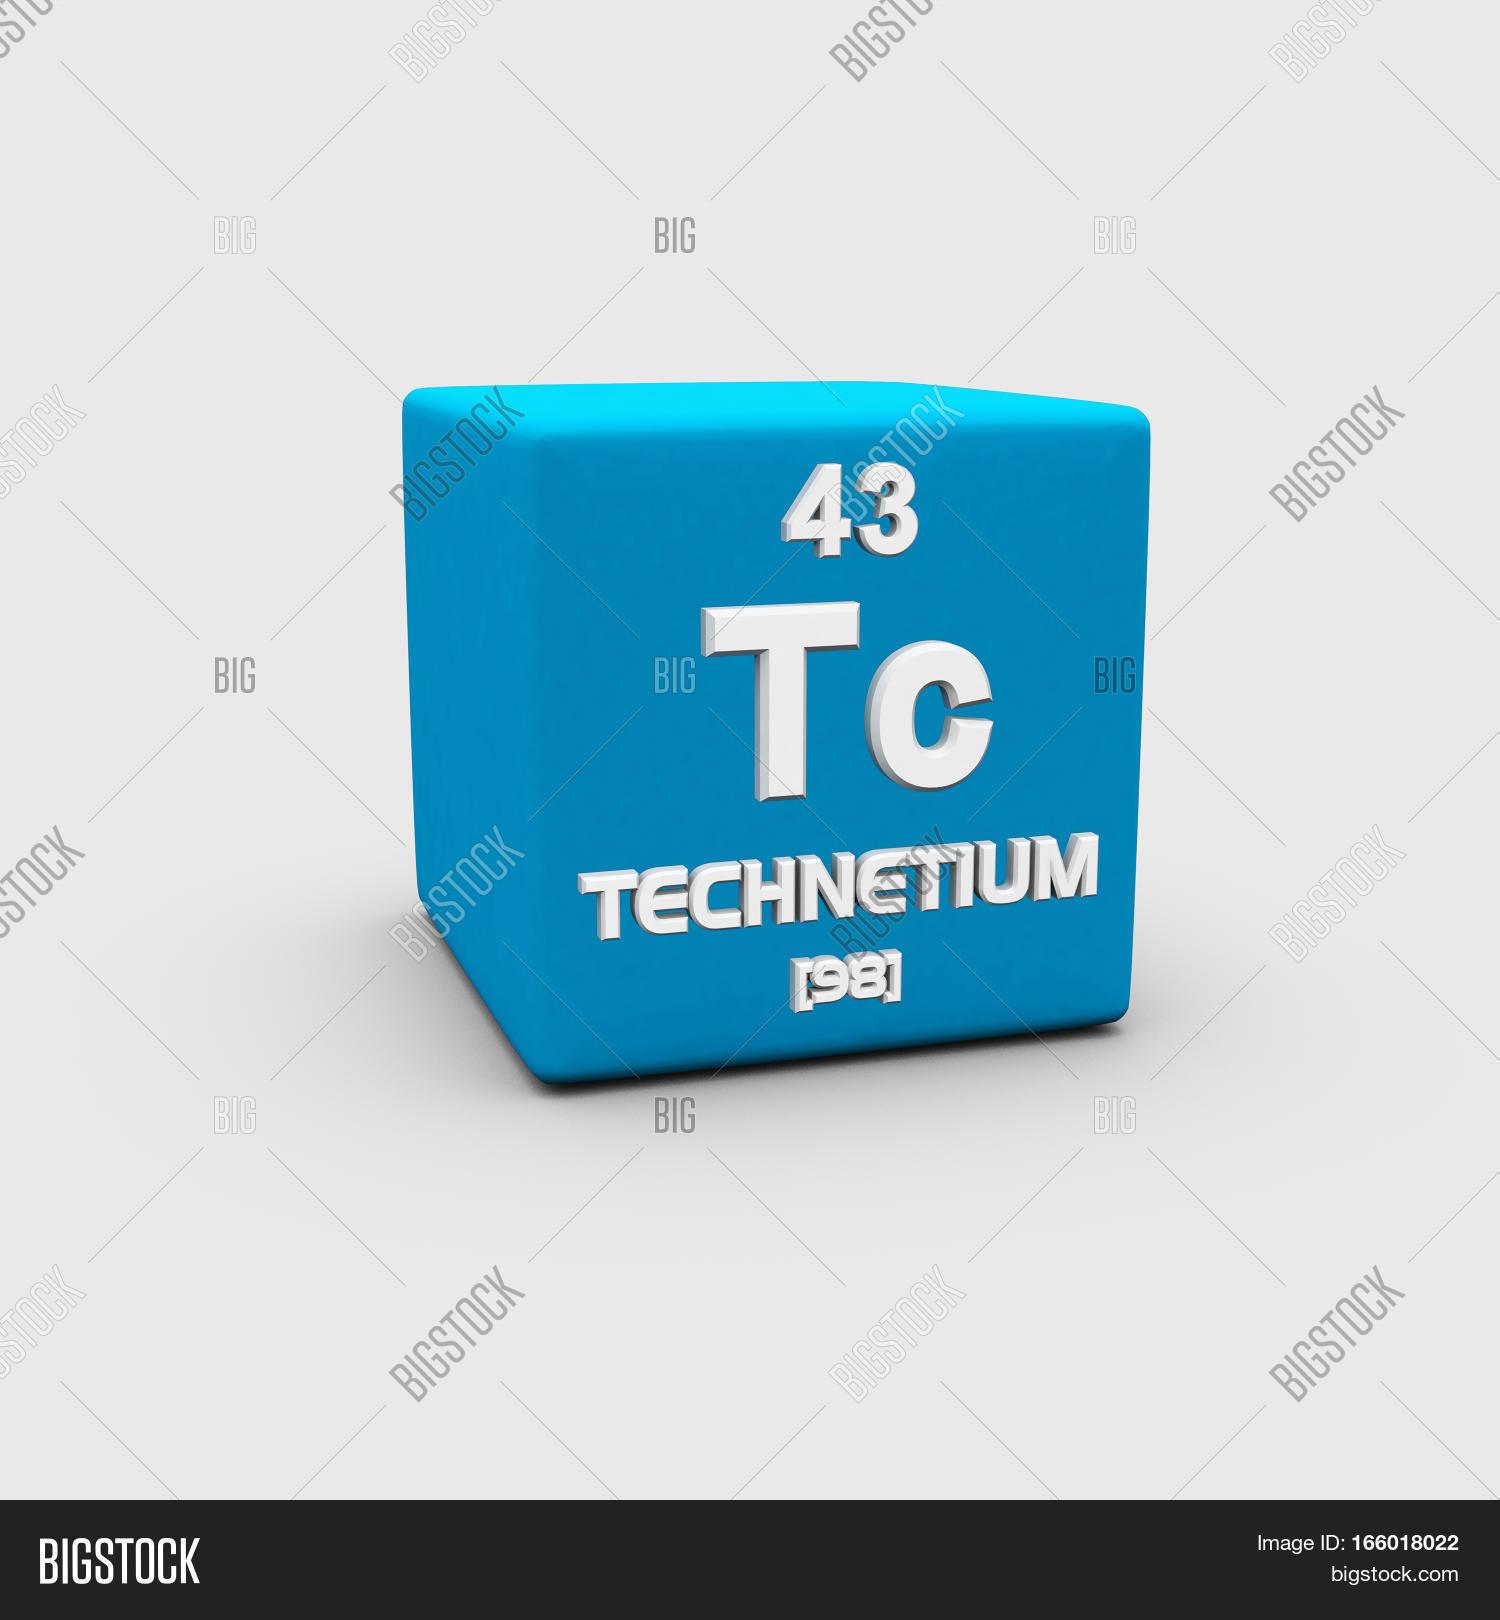 Technetium Chemical Image Photo Free Trial Bigstock